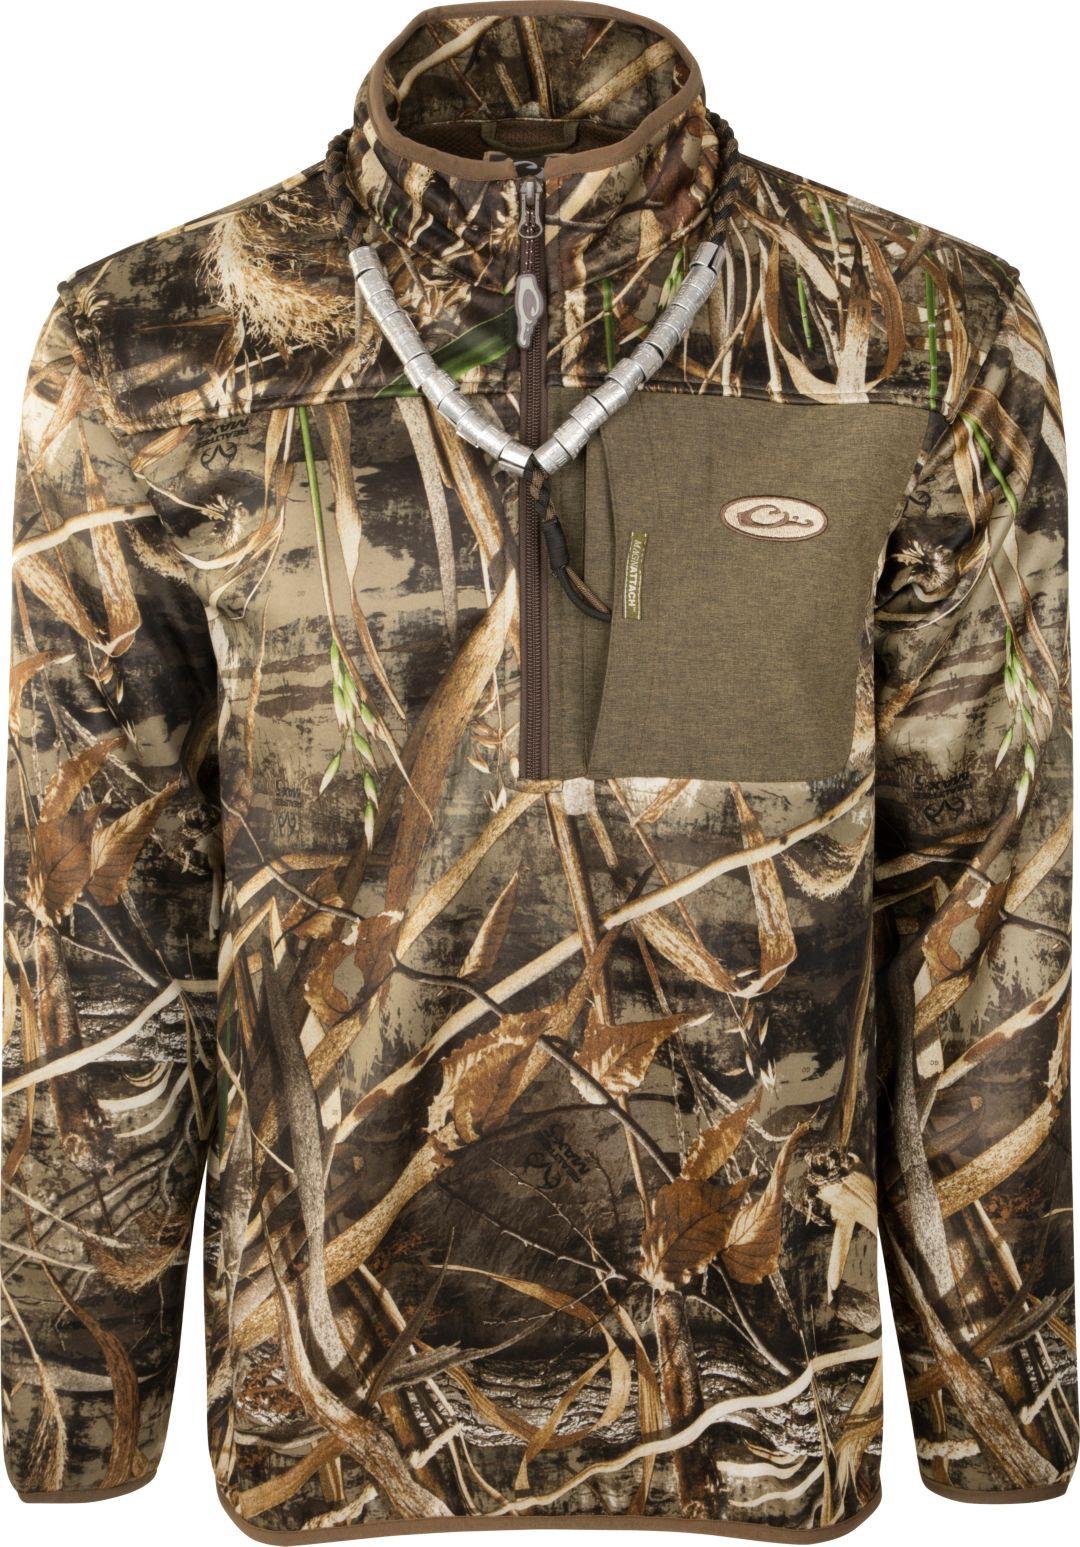 2e2b5926e0afb Drake Waterfowl Men's MST 1/4 Zip Hunting Jacket   DICK'S Sporting Goods